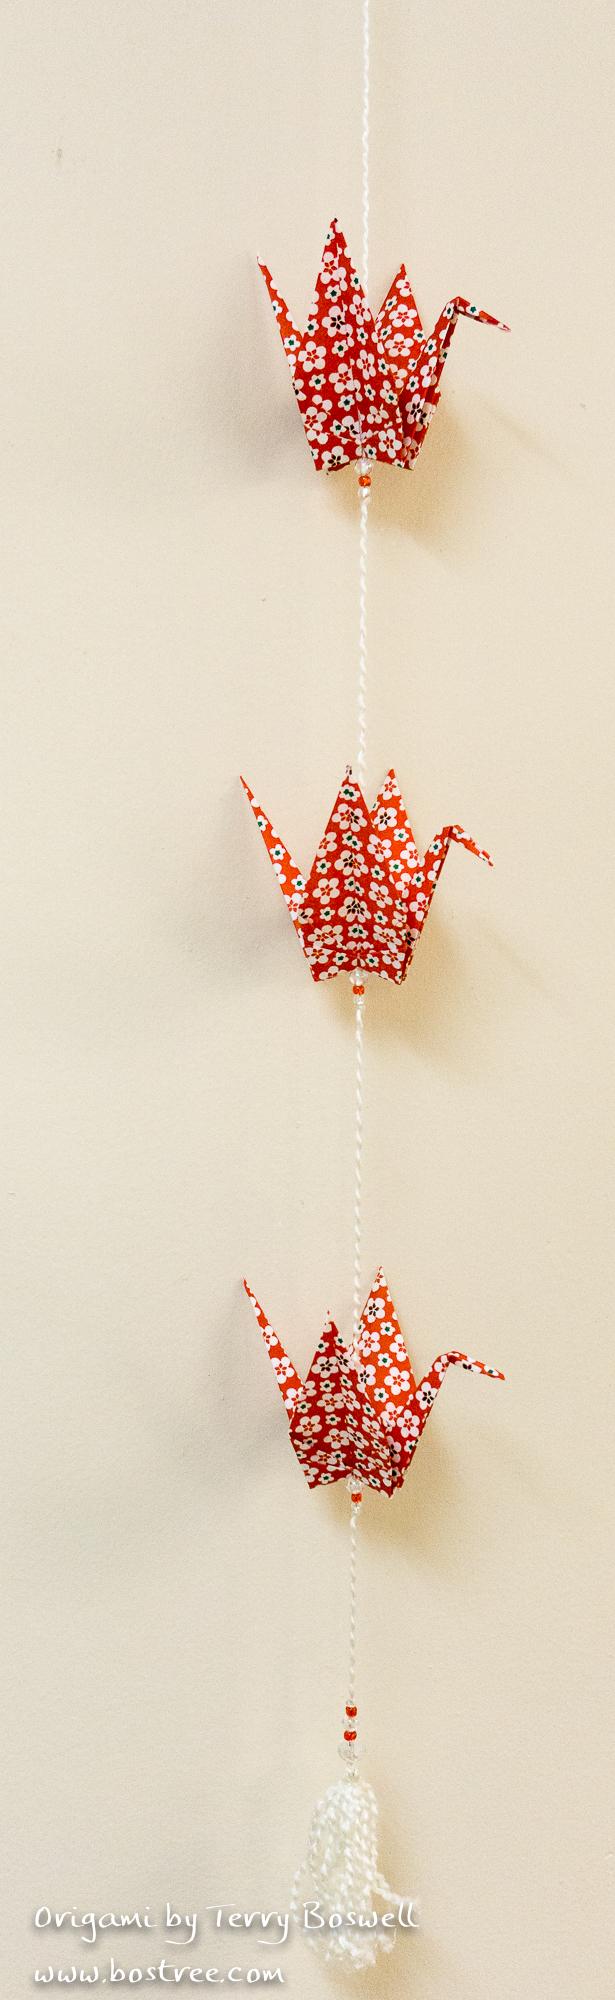 Three Crane Origami Mobile - Red, White OR00031